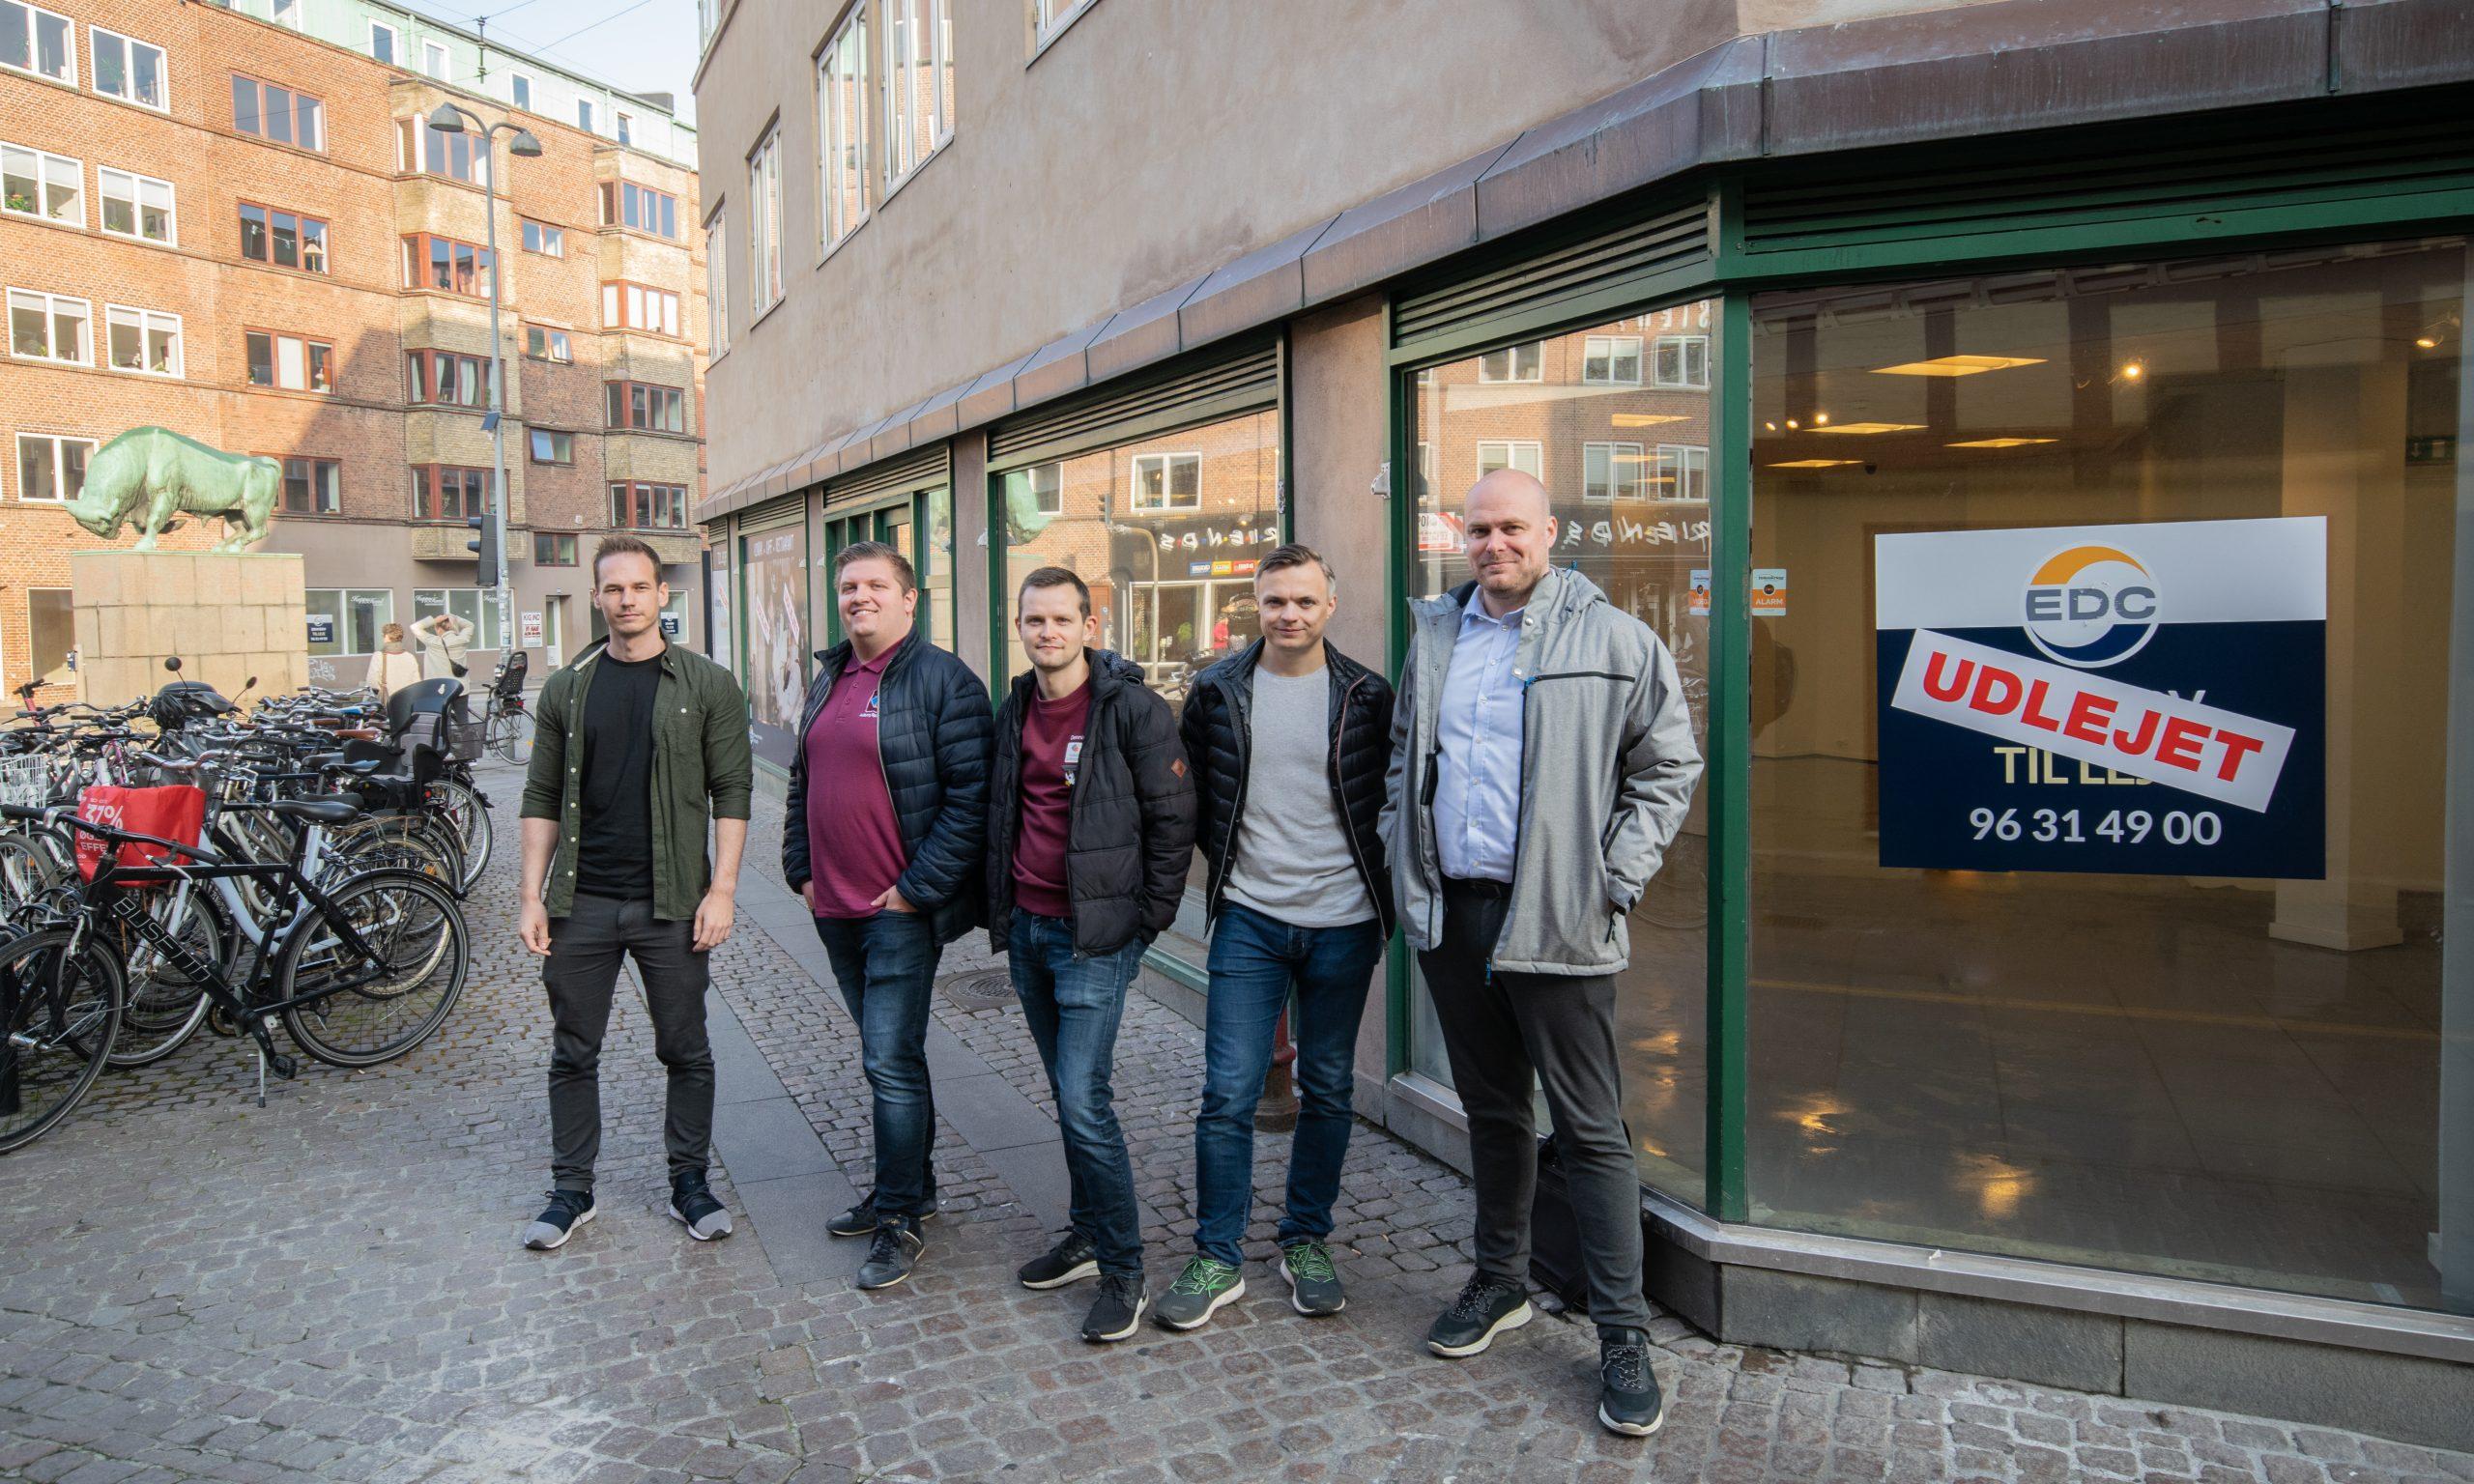 Vokseværk hos byens spil-mekka: Aalborg Spilforsyning flytter i dobbelt så stor butik